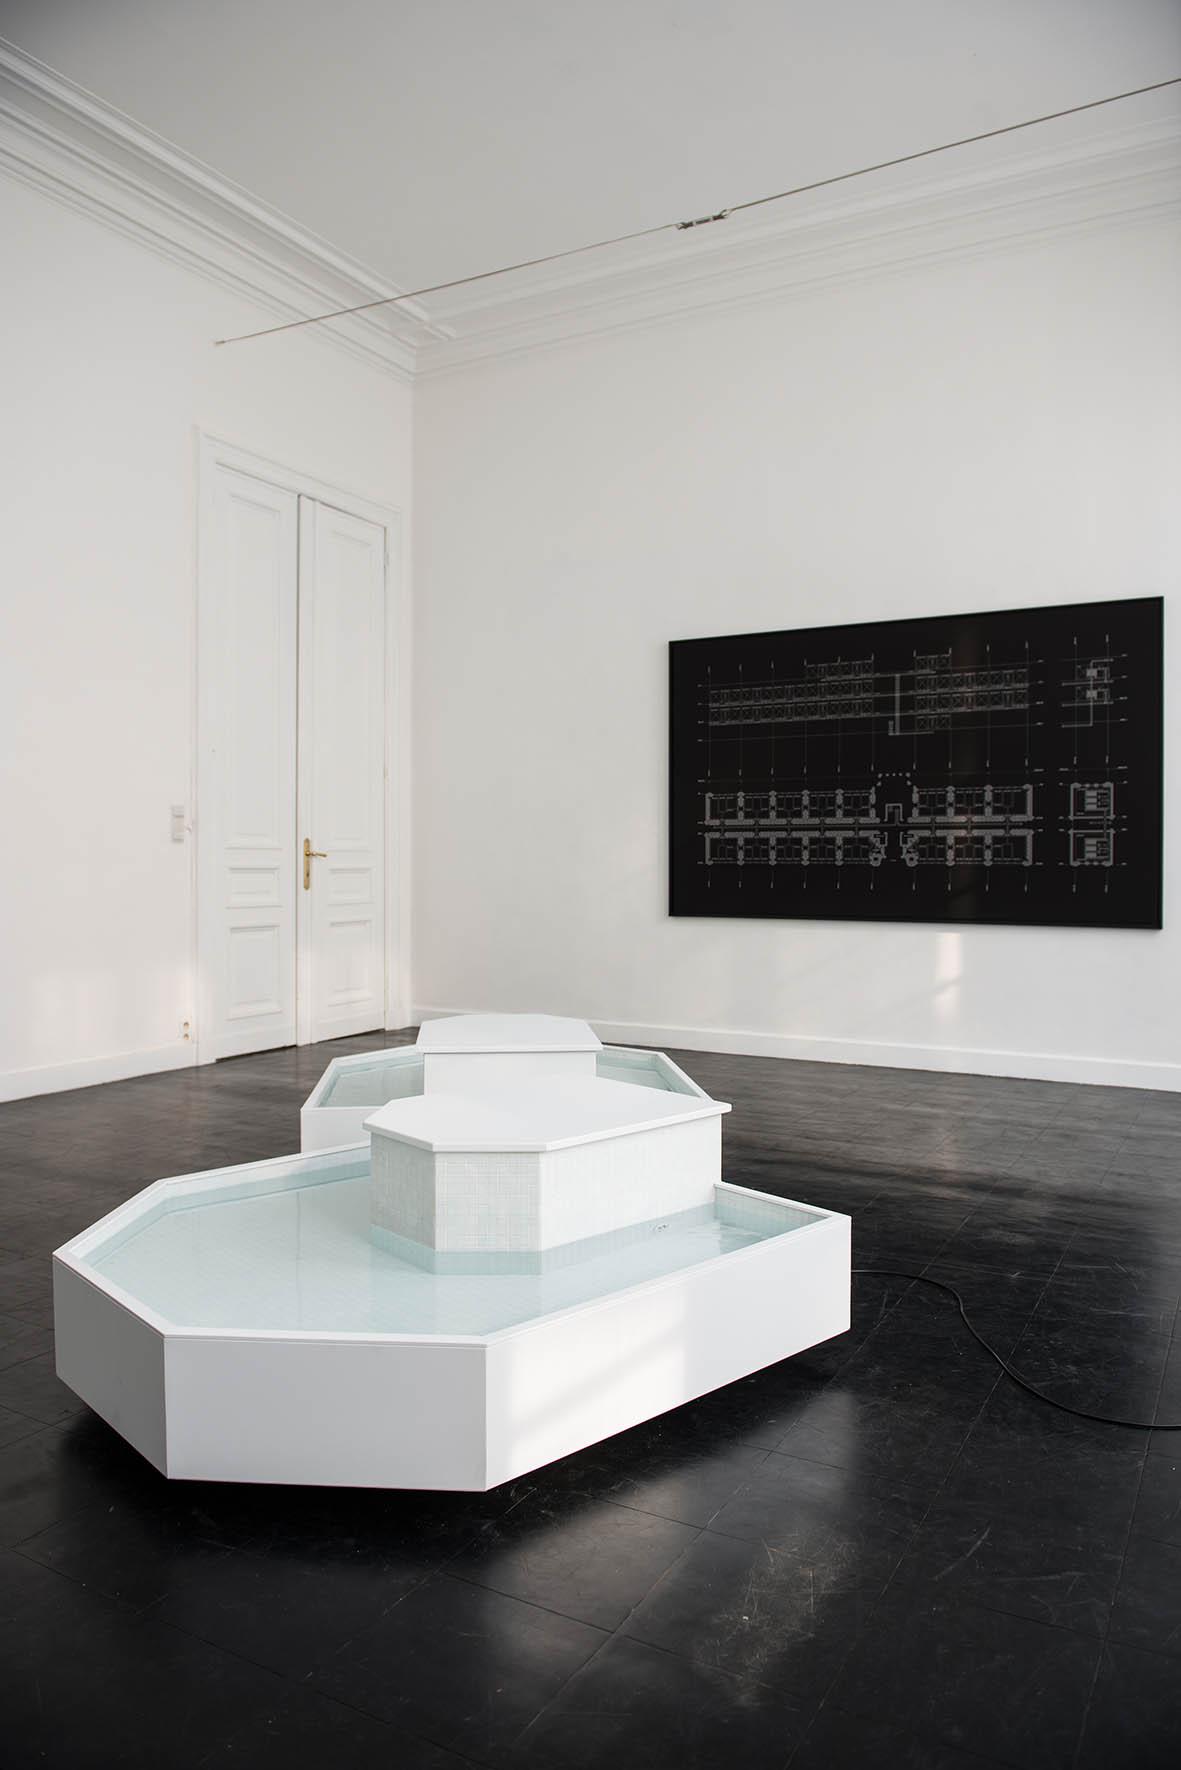 Wesley Meuris, Notes, 2015